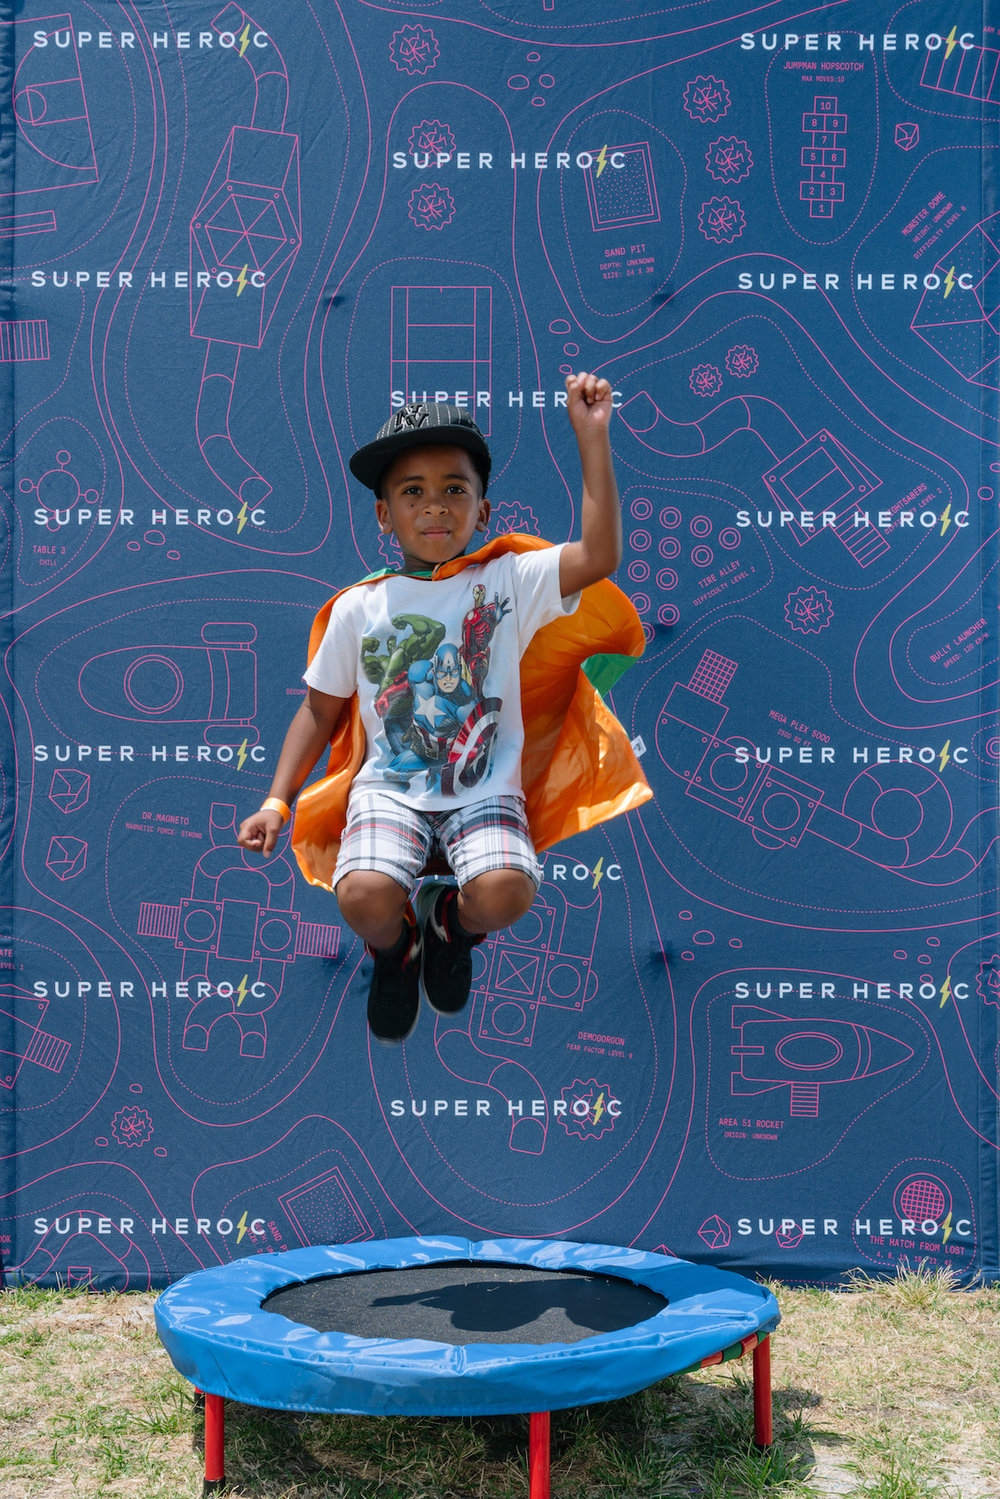 Super Heroic